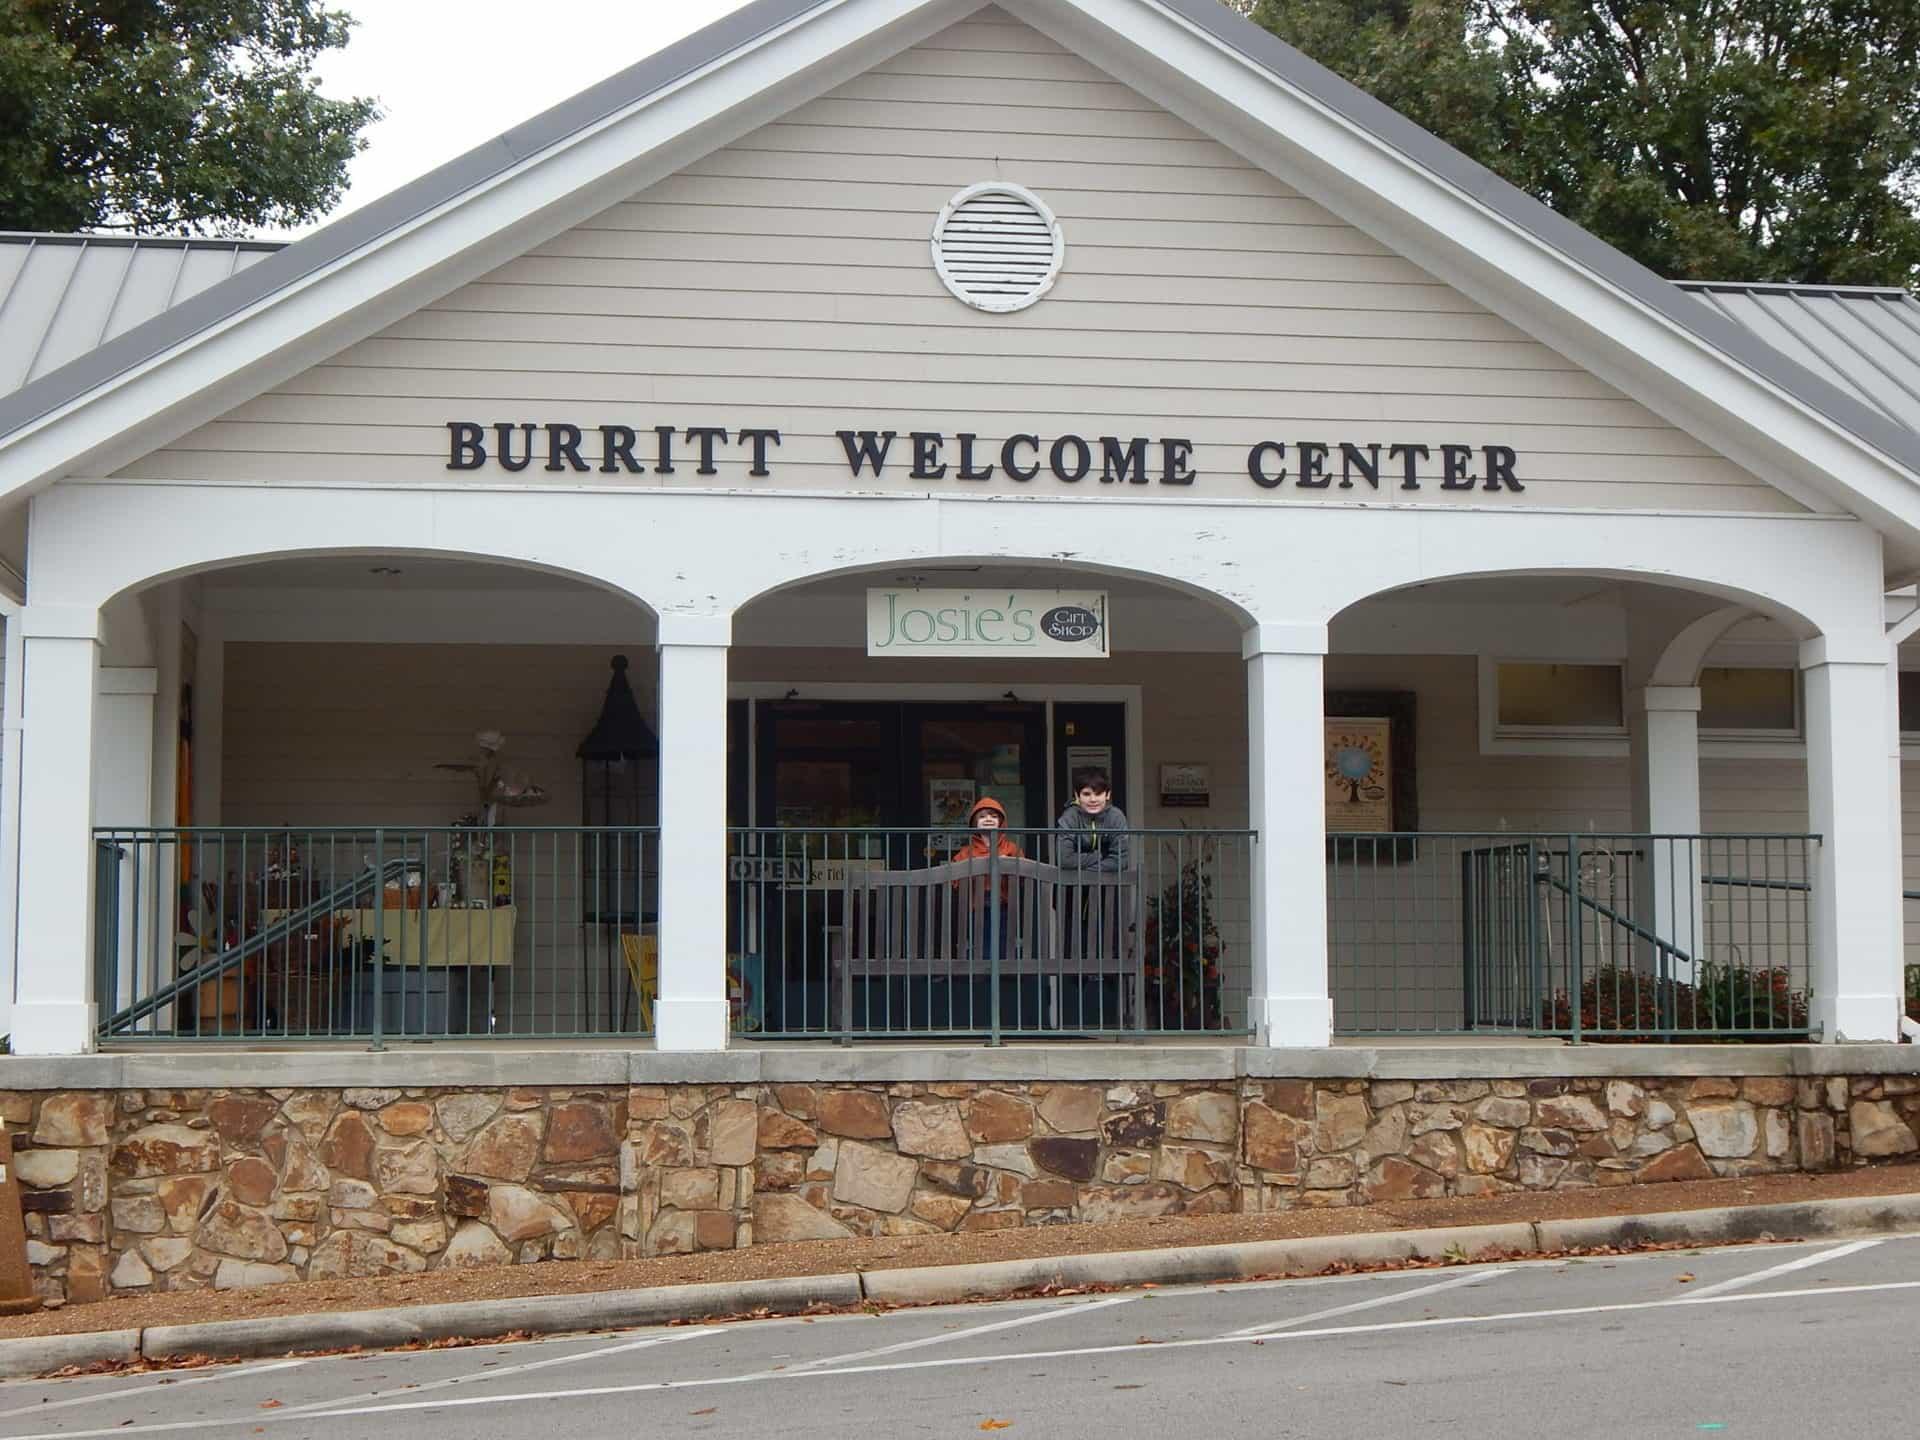 Burritt on the Mountain - Welcome Center